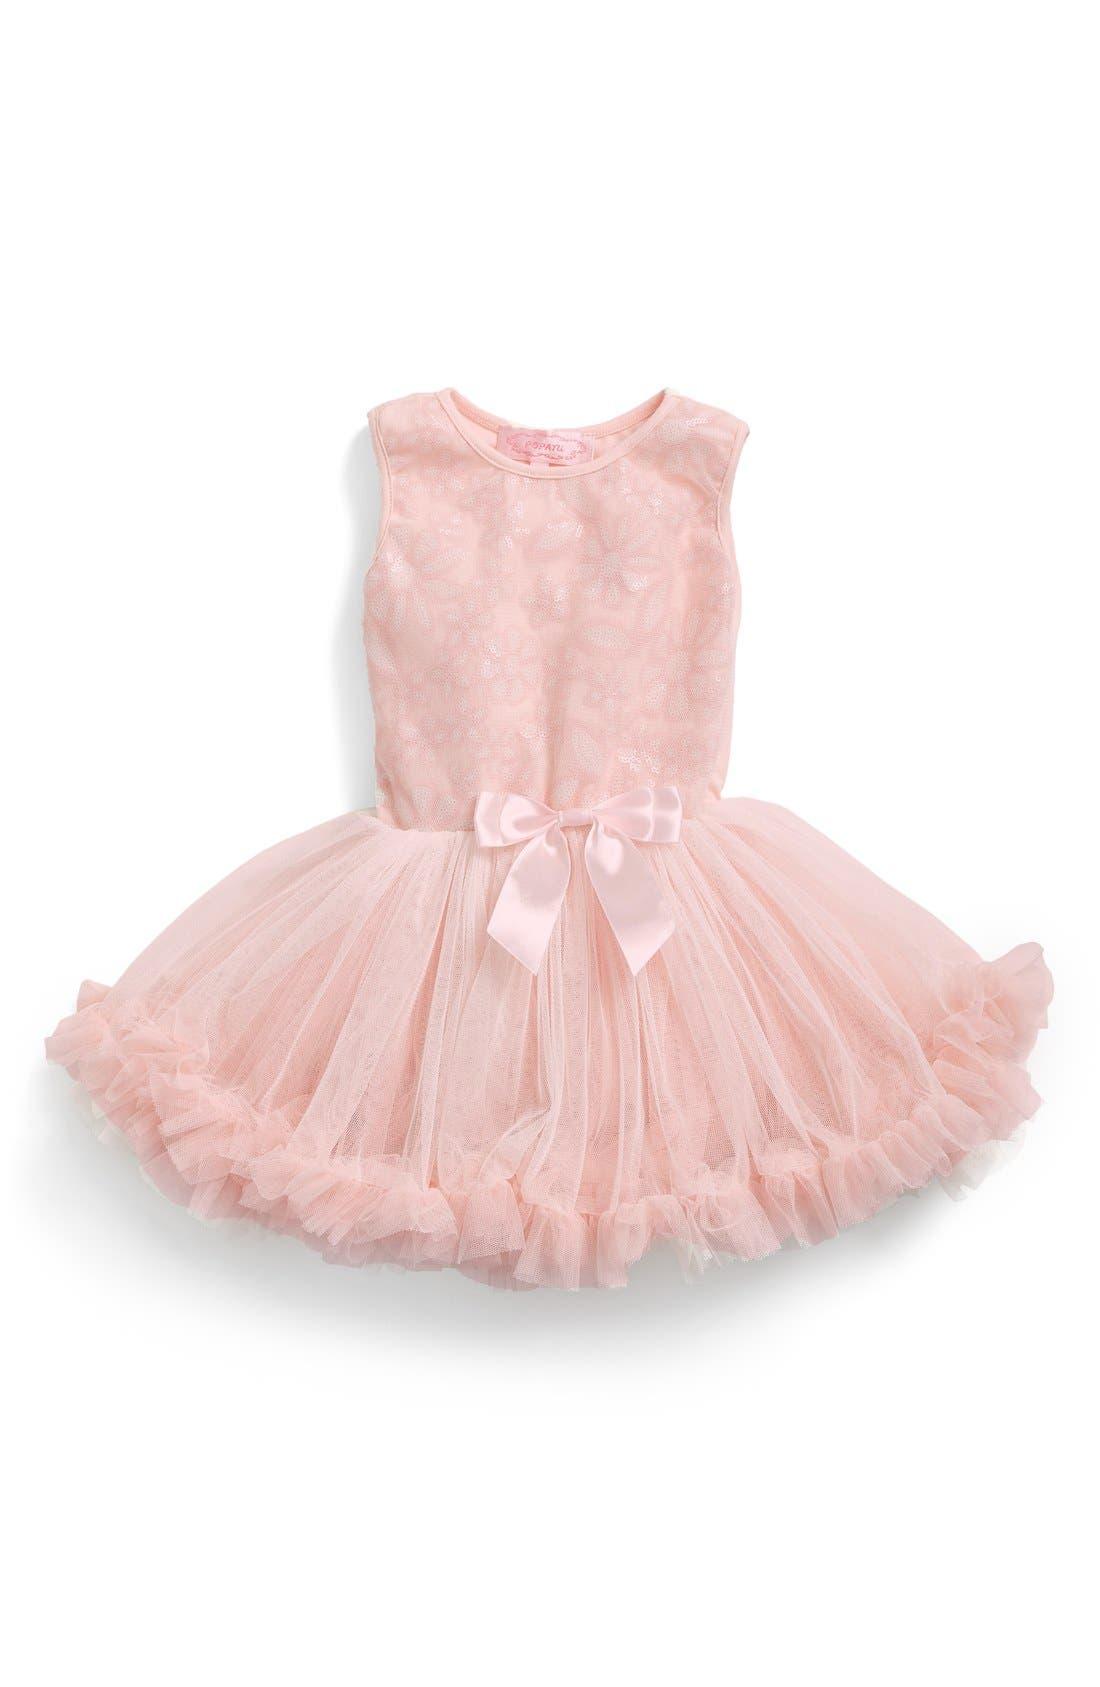 Main Image - Popatu Floral Sequin Pettidress (Baby Girls)